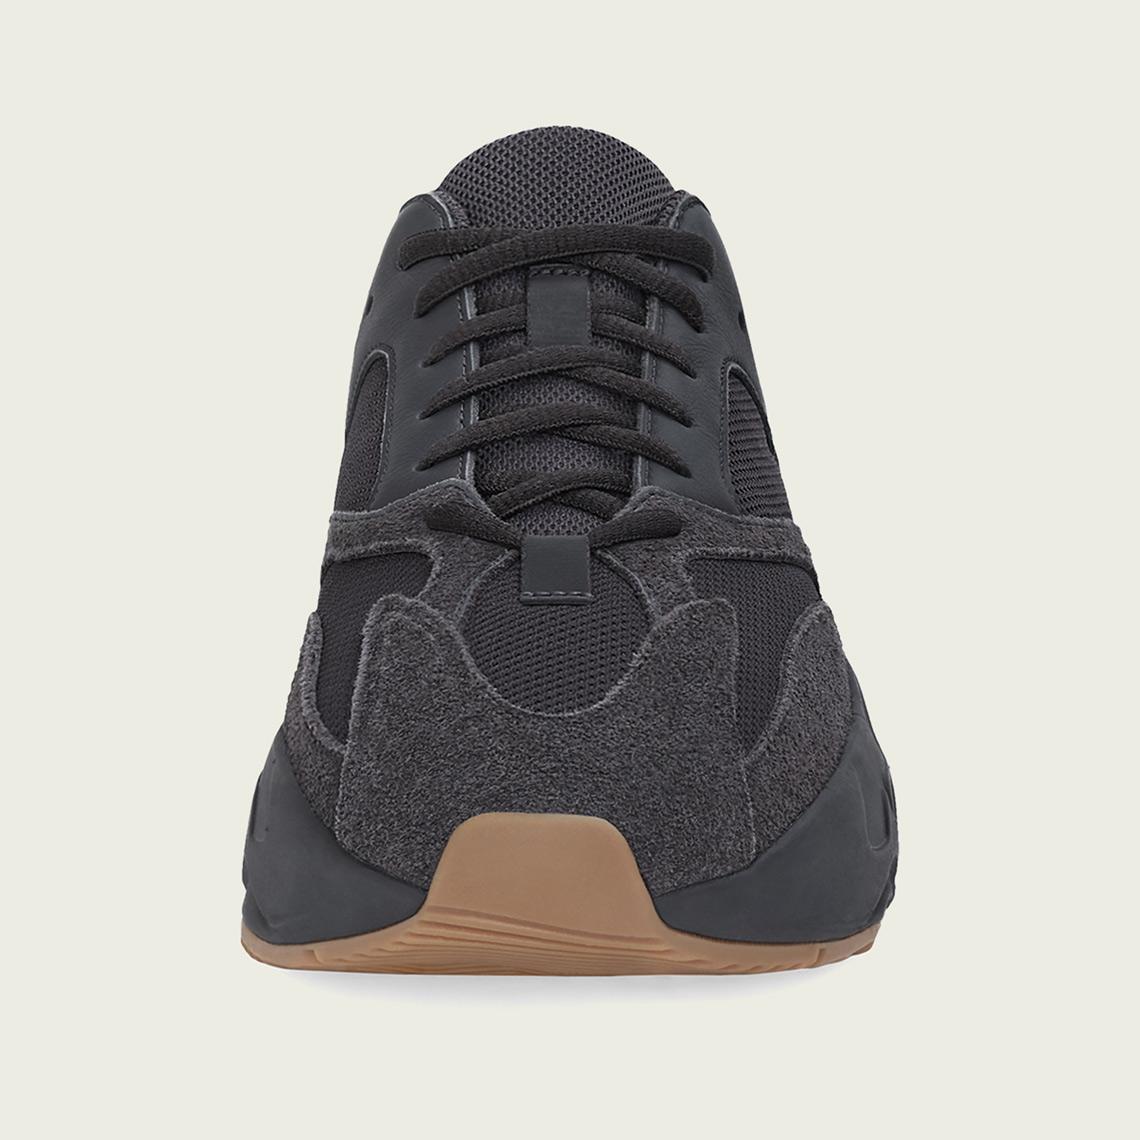 hot sale online 5d39e 19d24 adidas Yeezy 700 Utility Black FV5304 Release Date ...